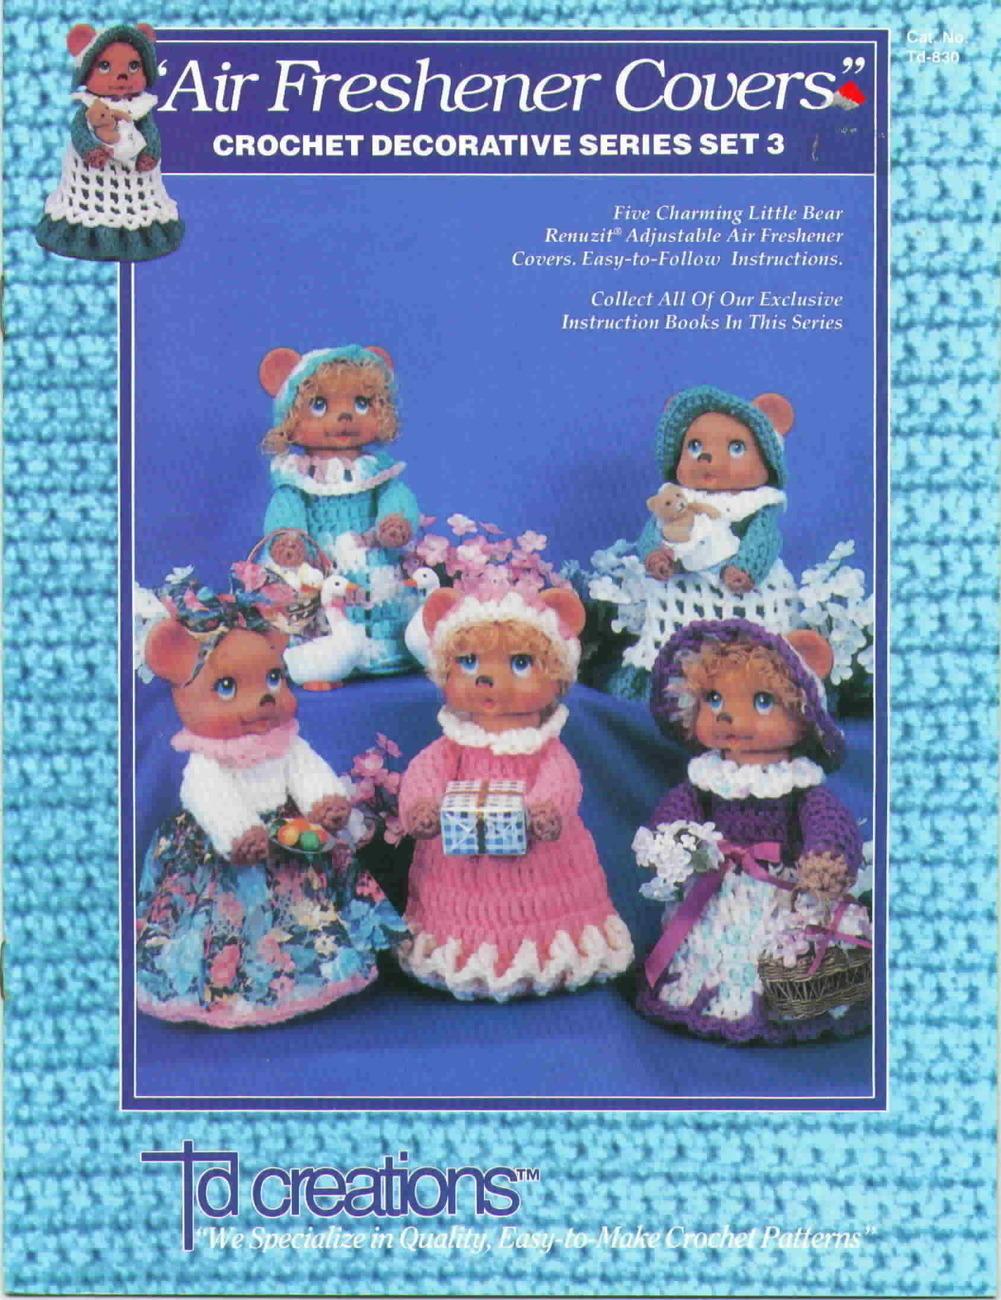 Td creations air freshener cover set 3 crochet